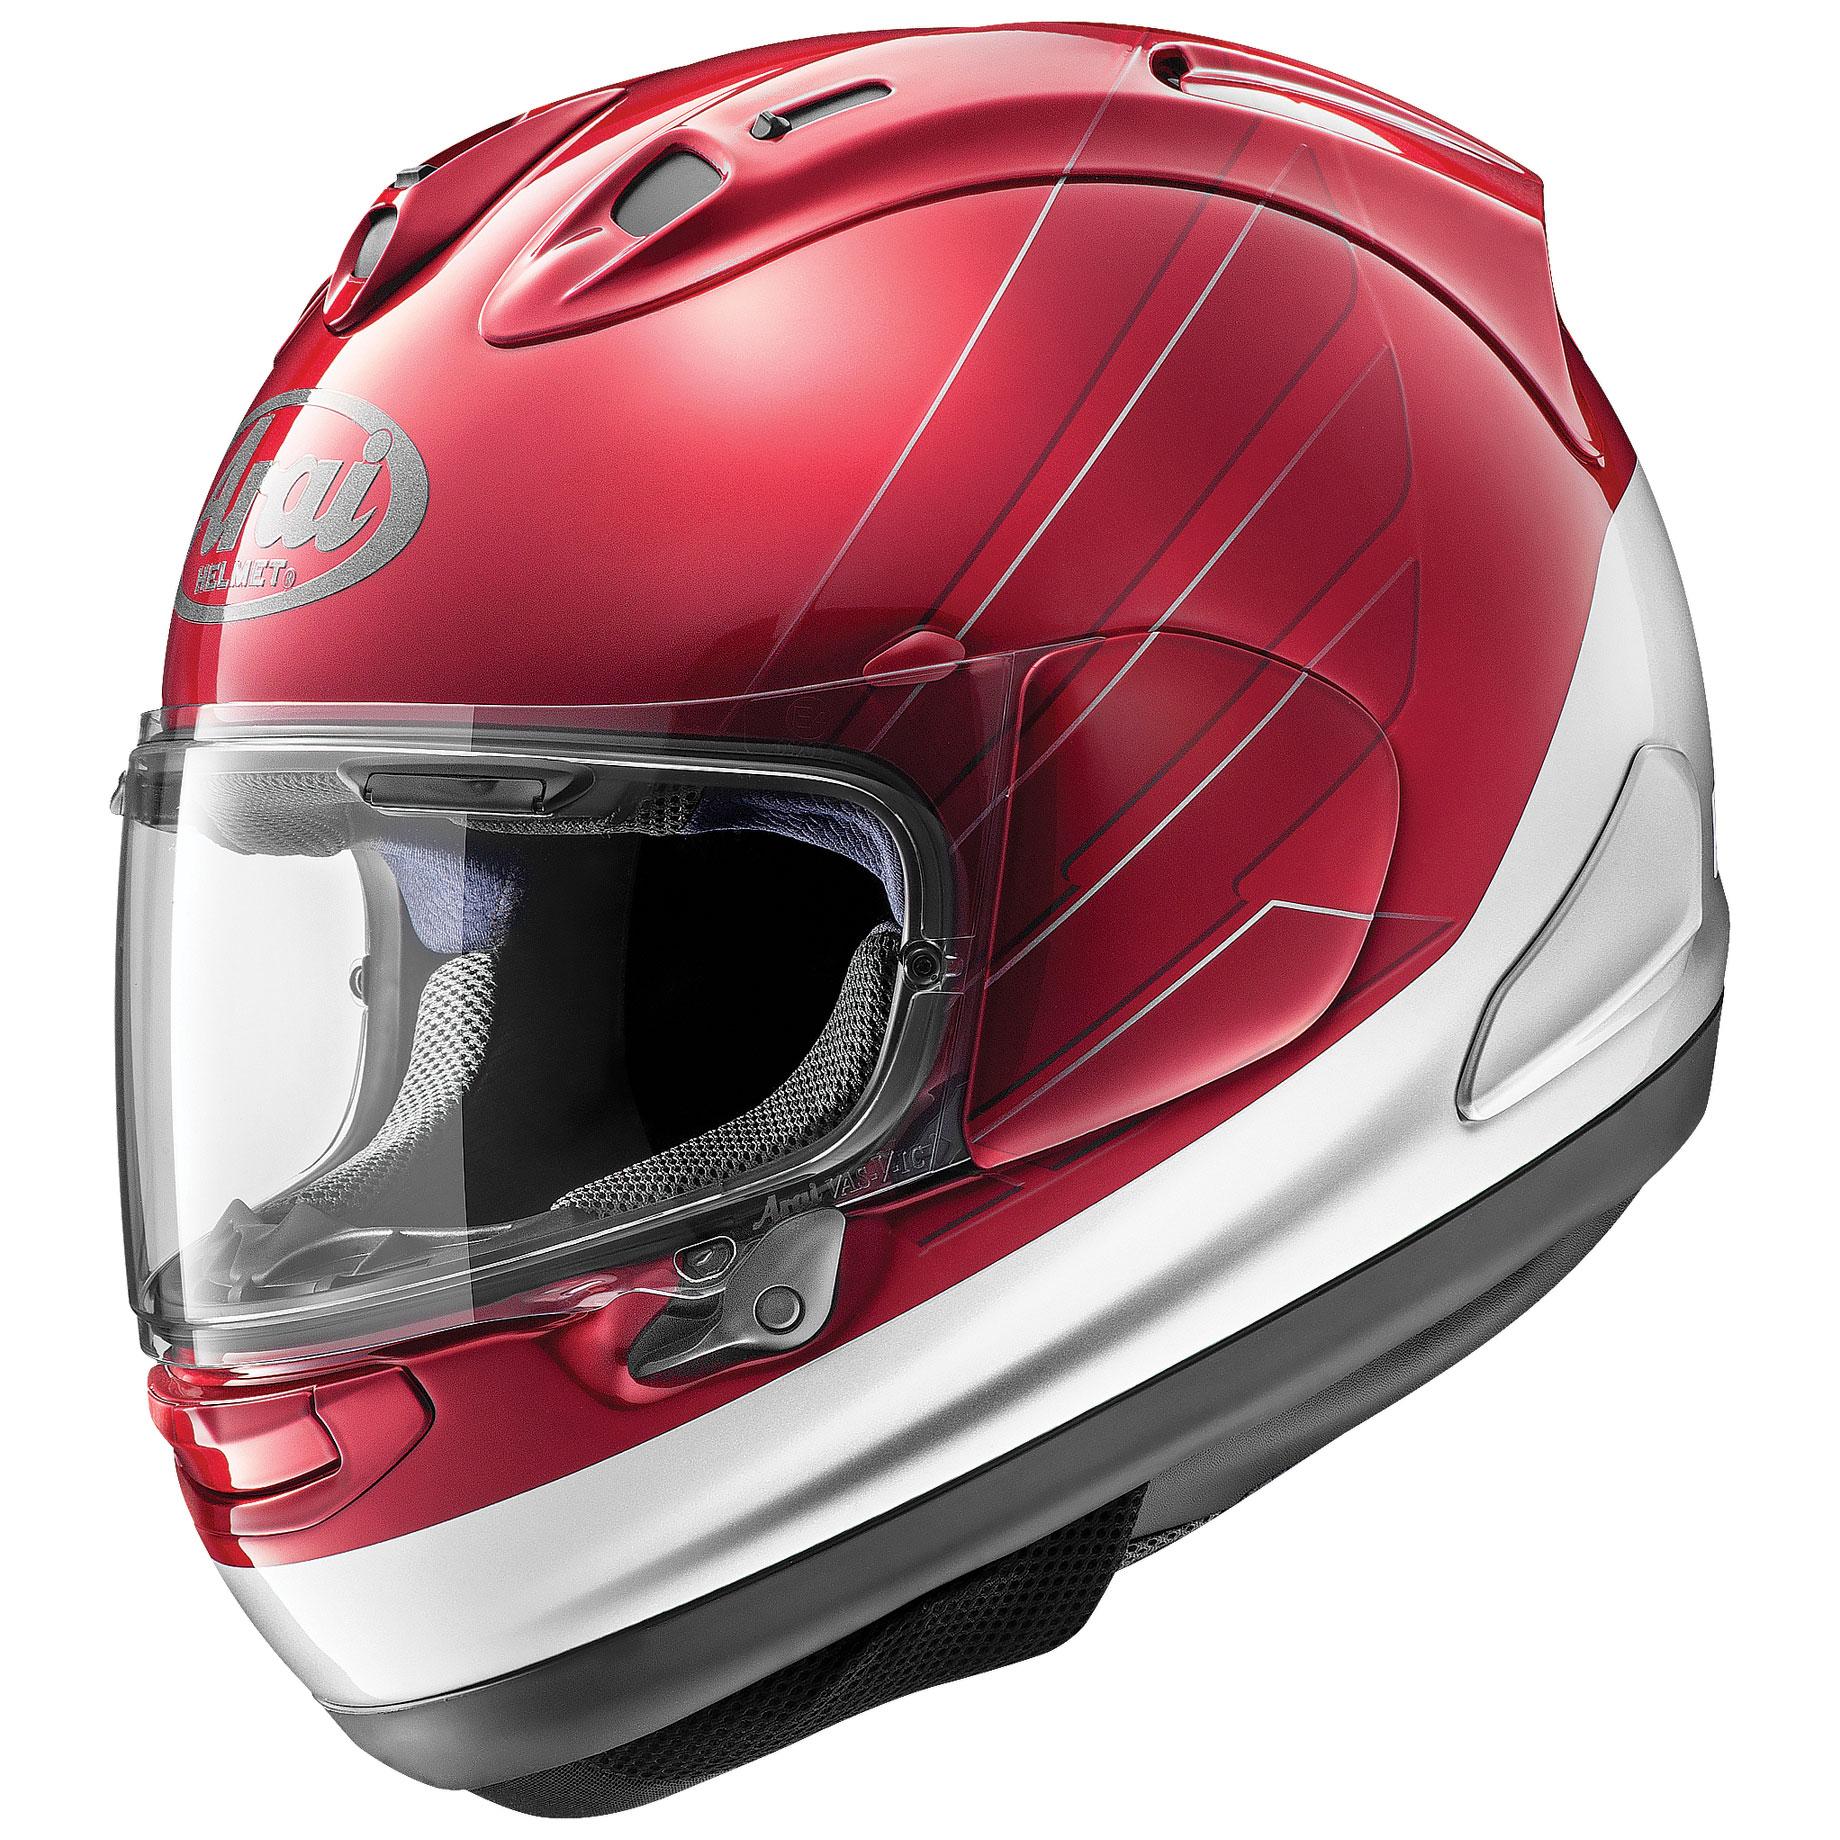 Arai Corsair-X CB Red/Silver Full Face Helmet